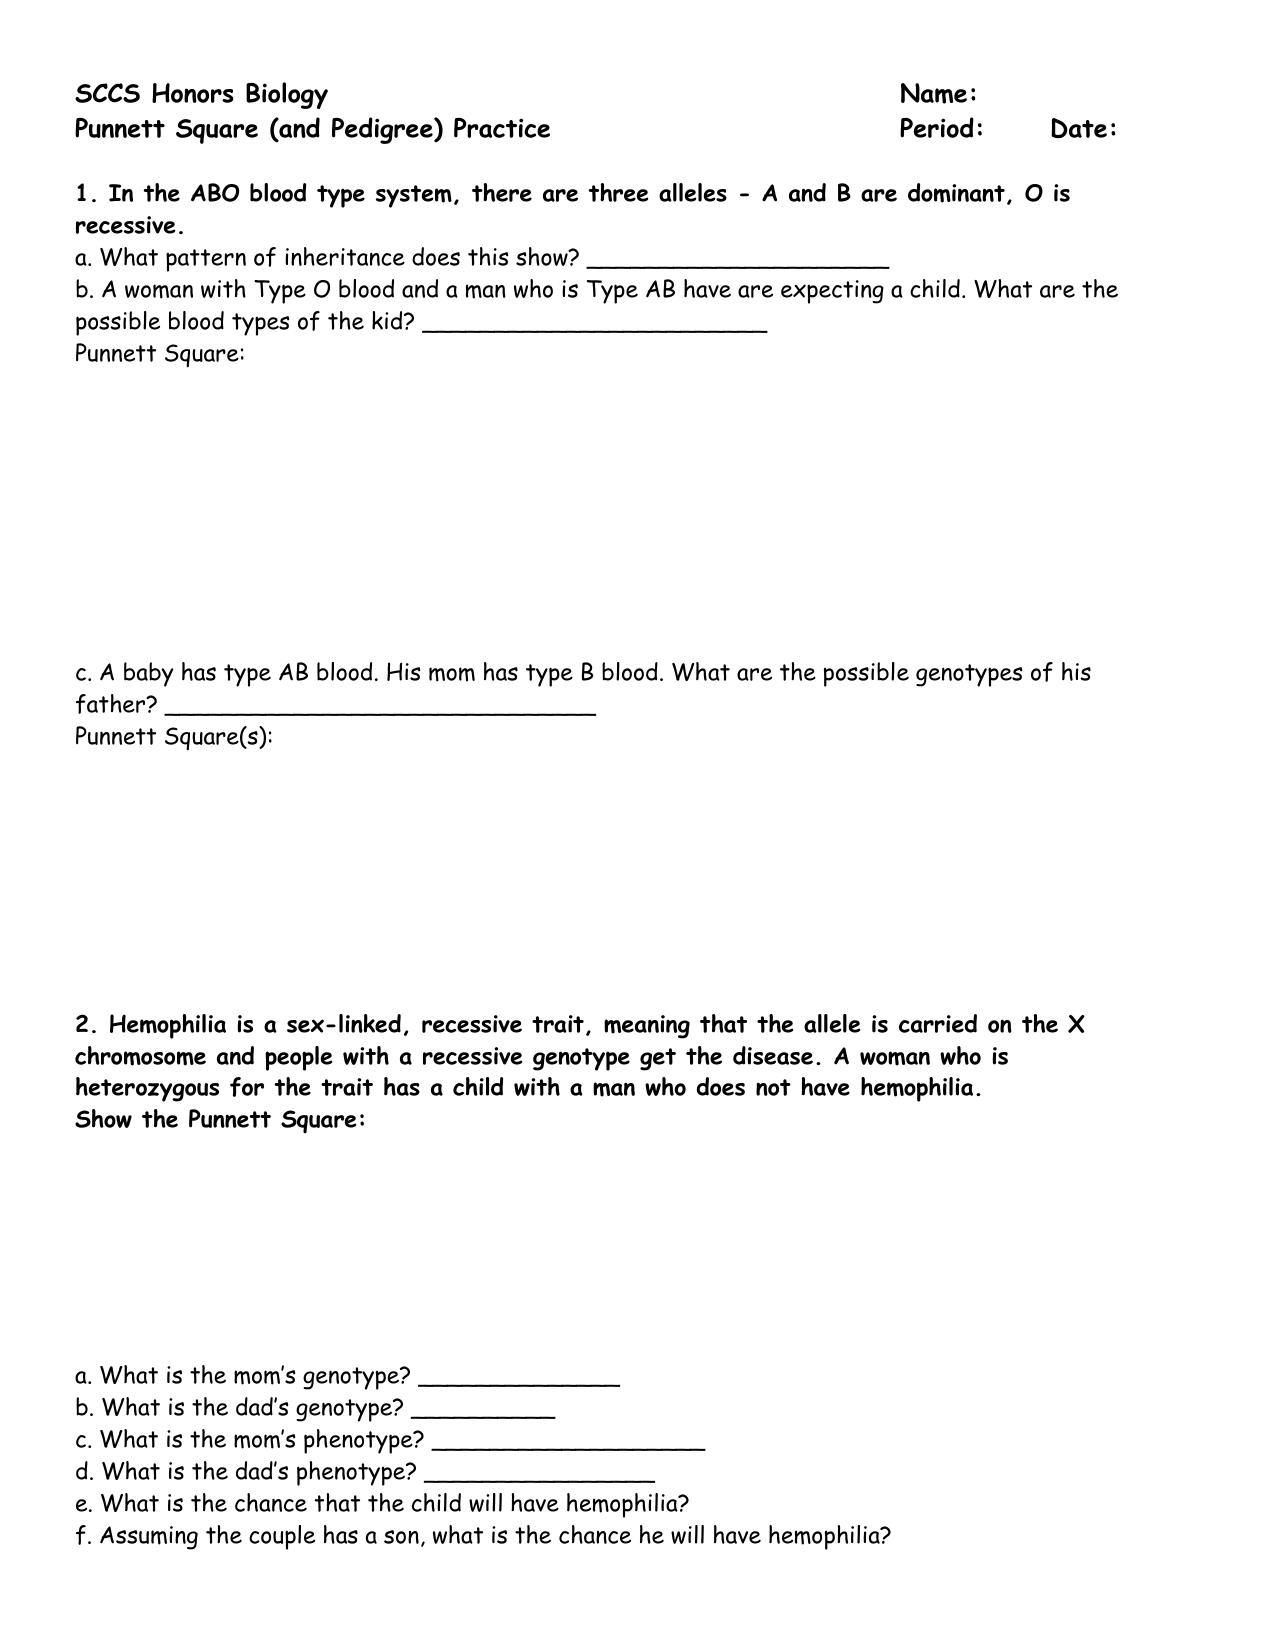 Punnett Square Practice Worksheet Answers Biology